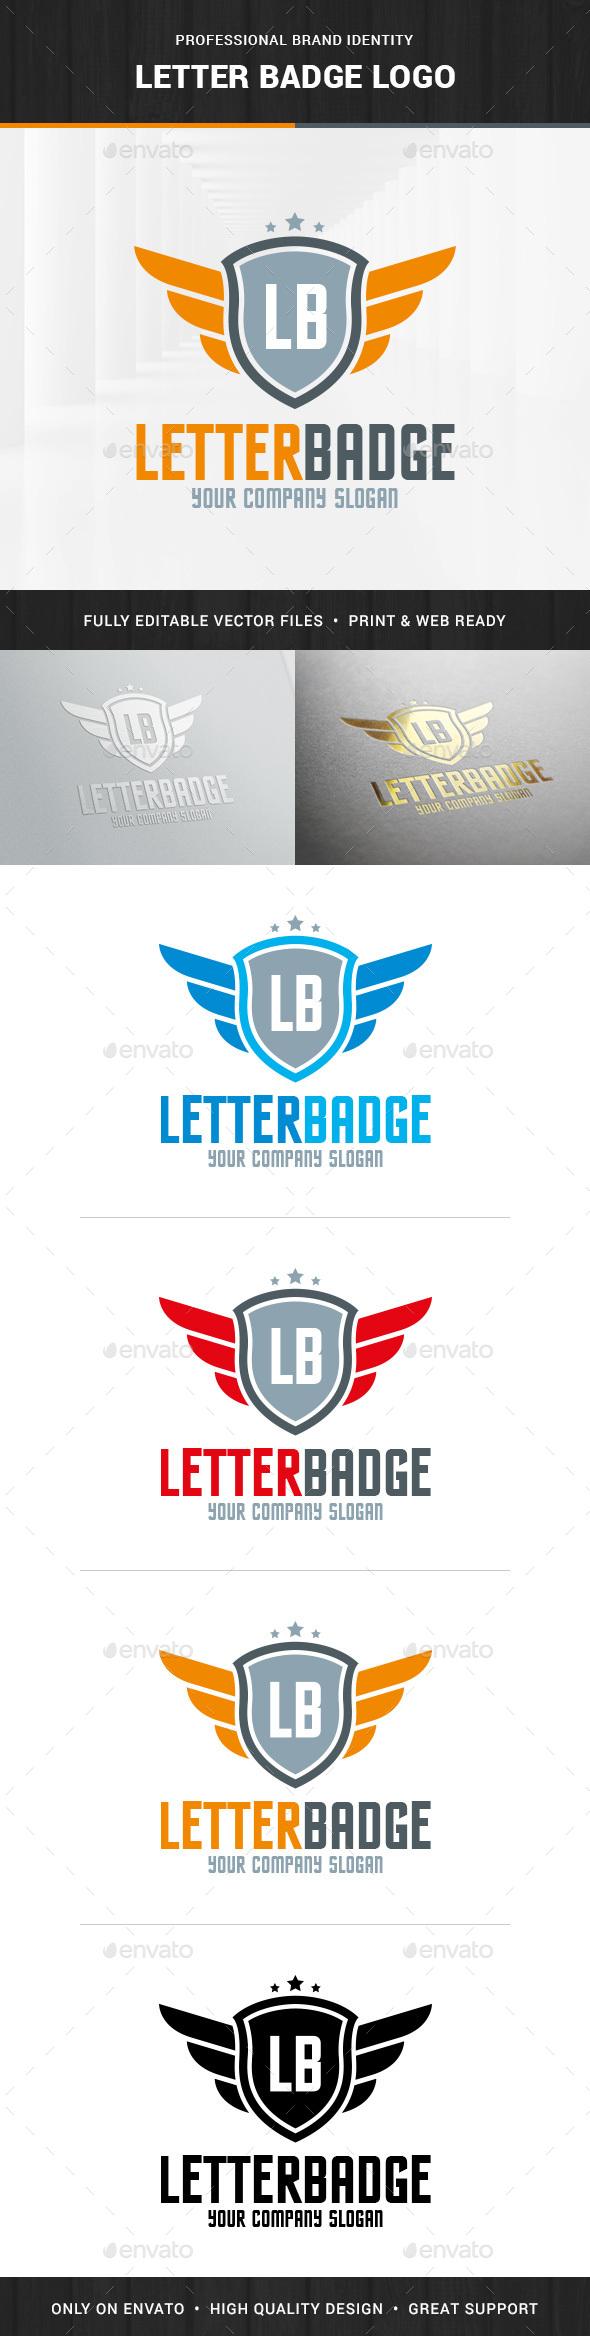 Letter Badge Logo Template - Letters Logo Templates